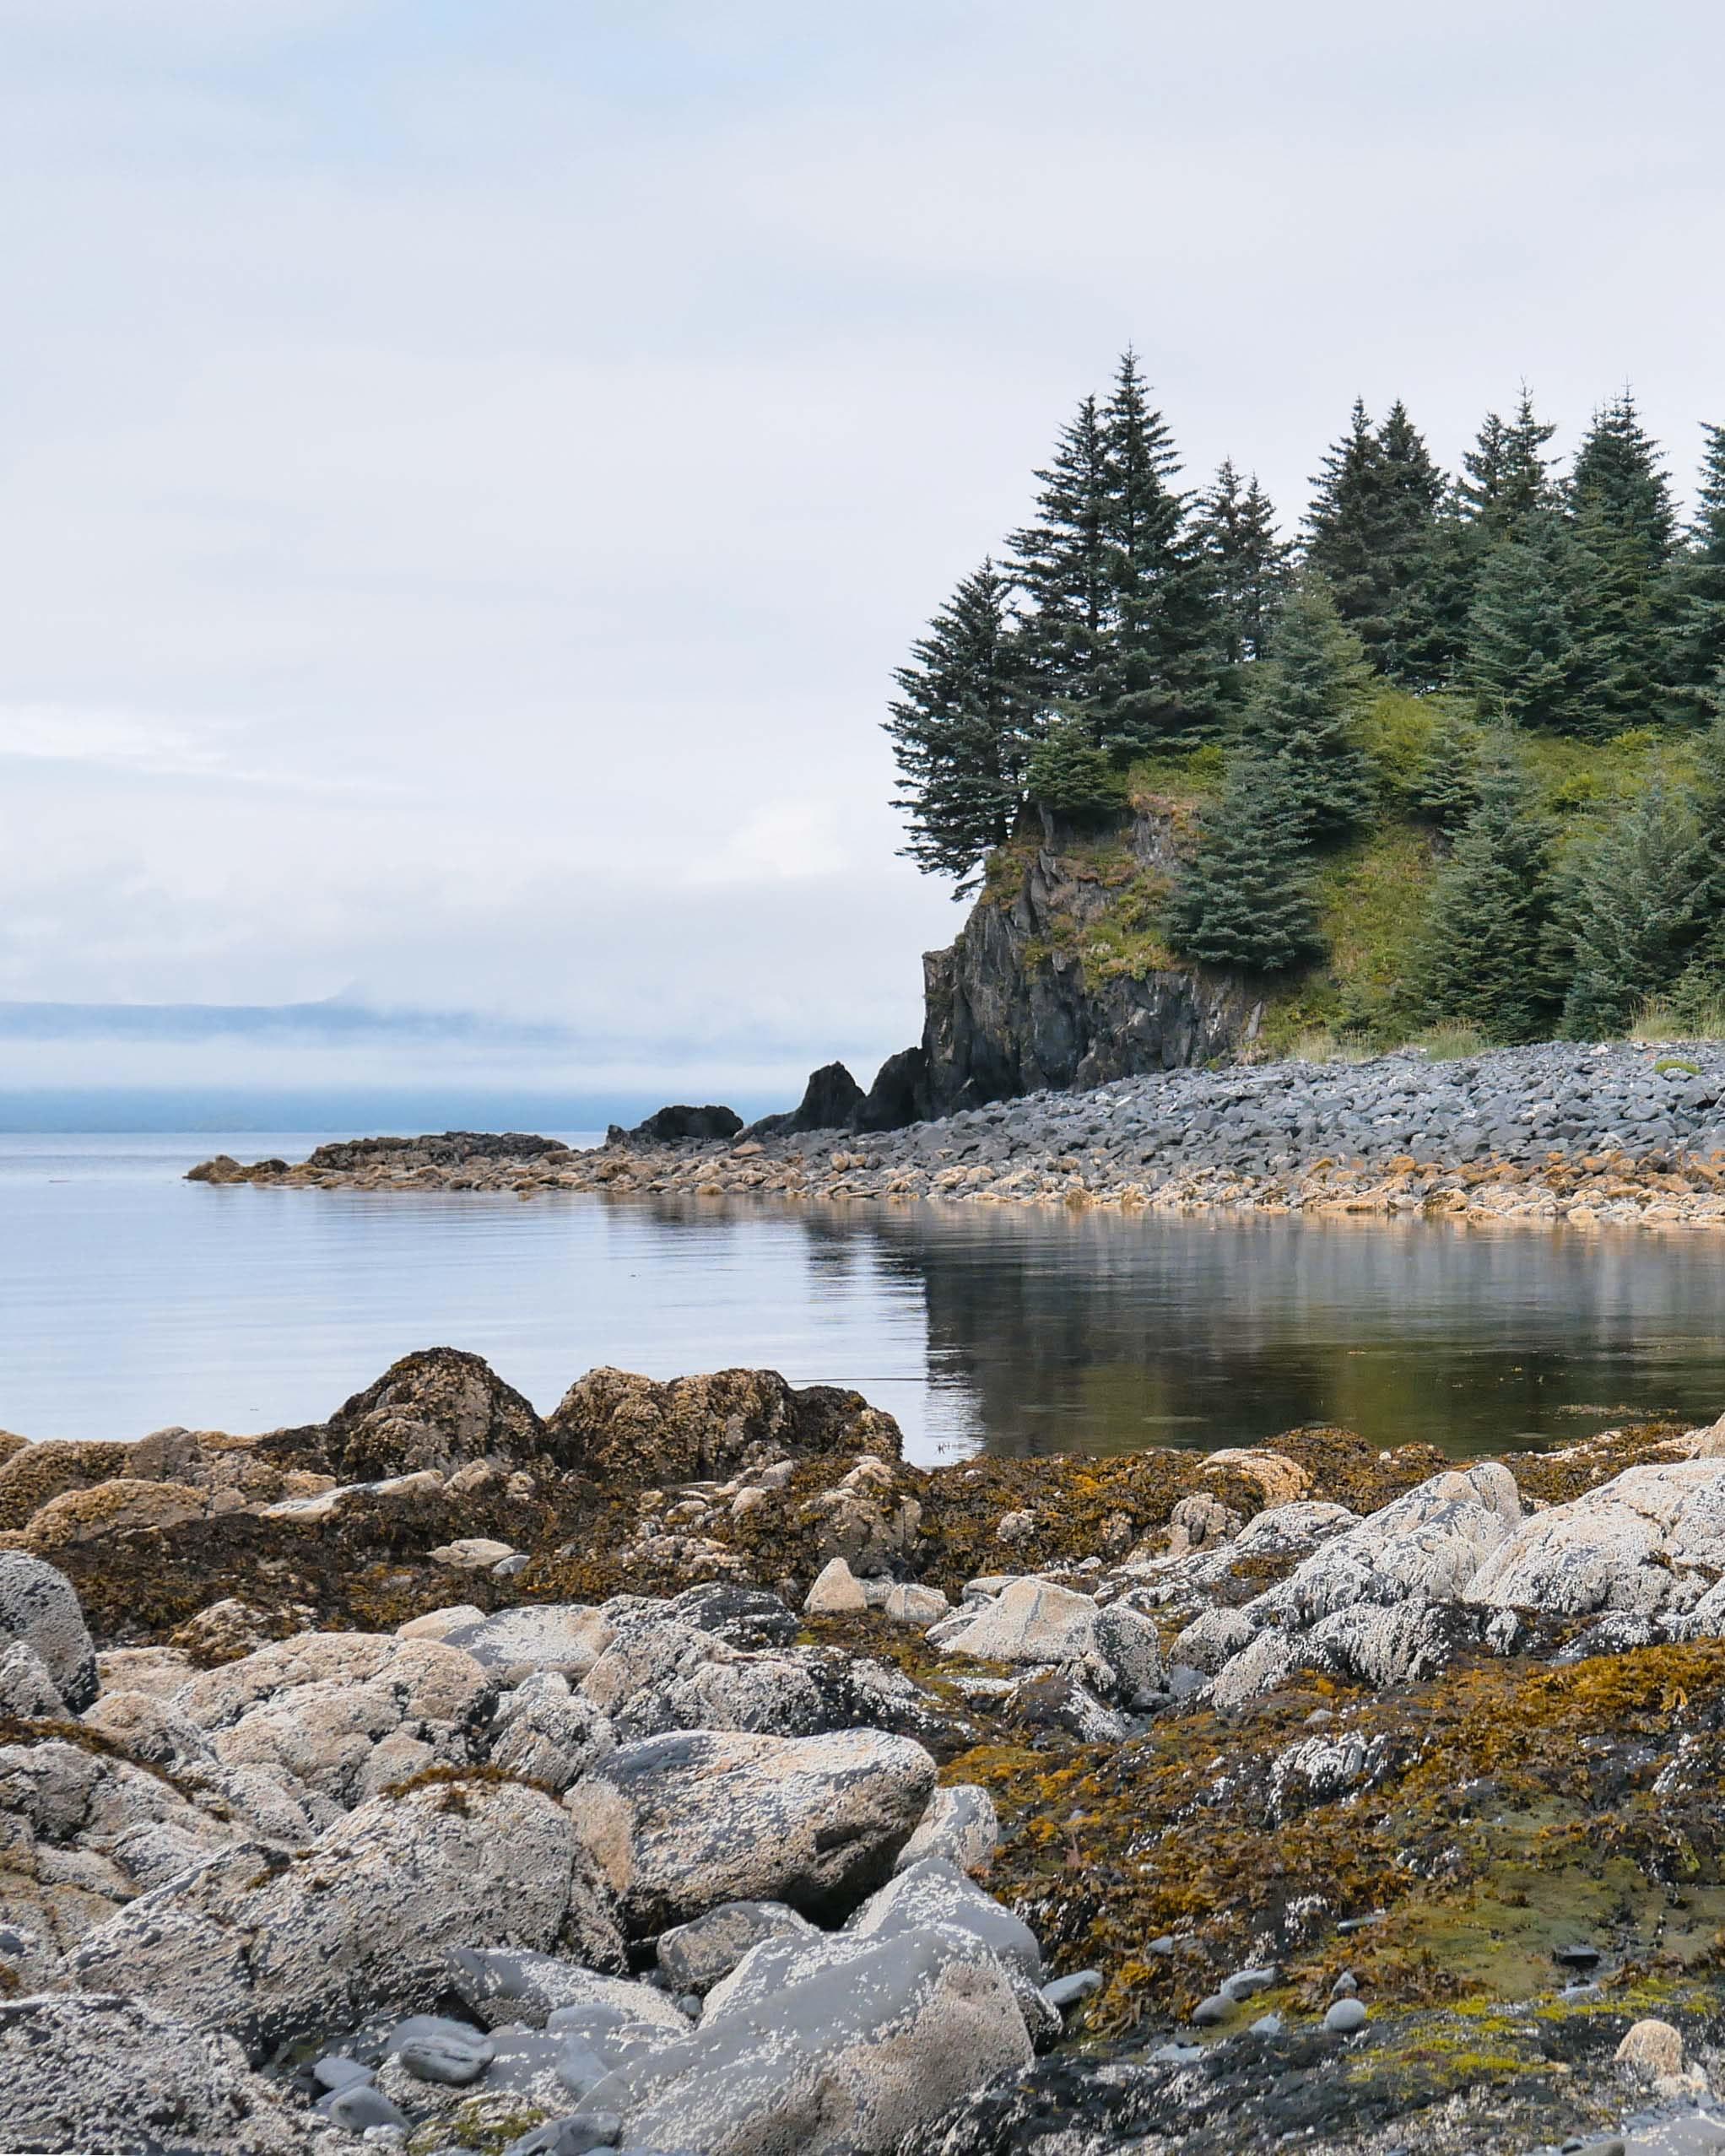 Image of the coastline